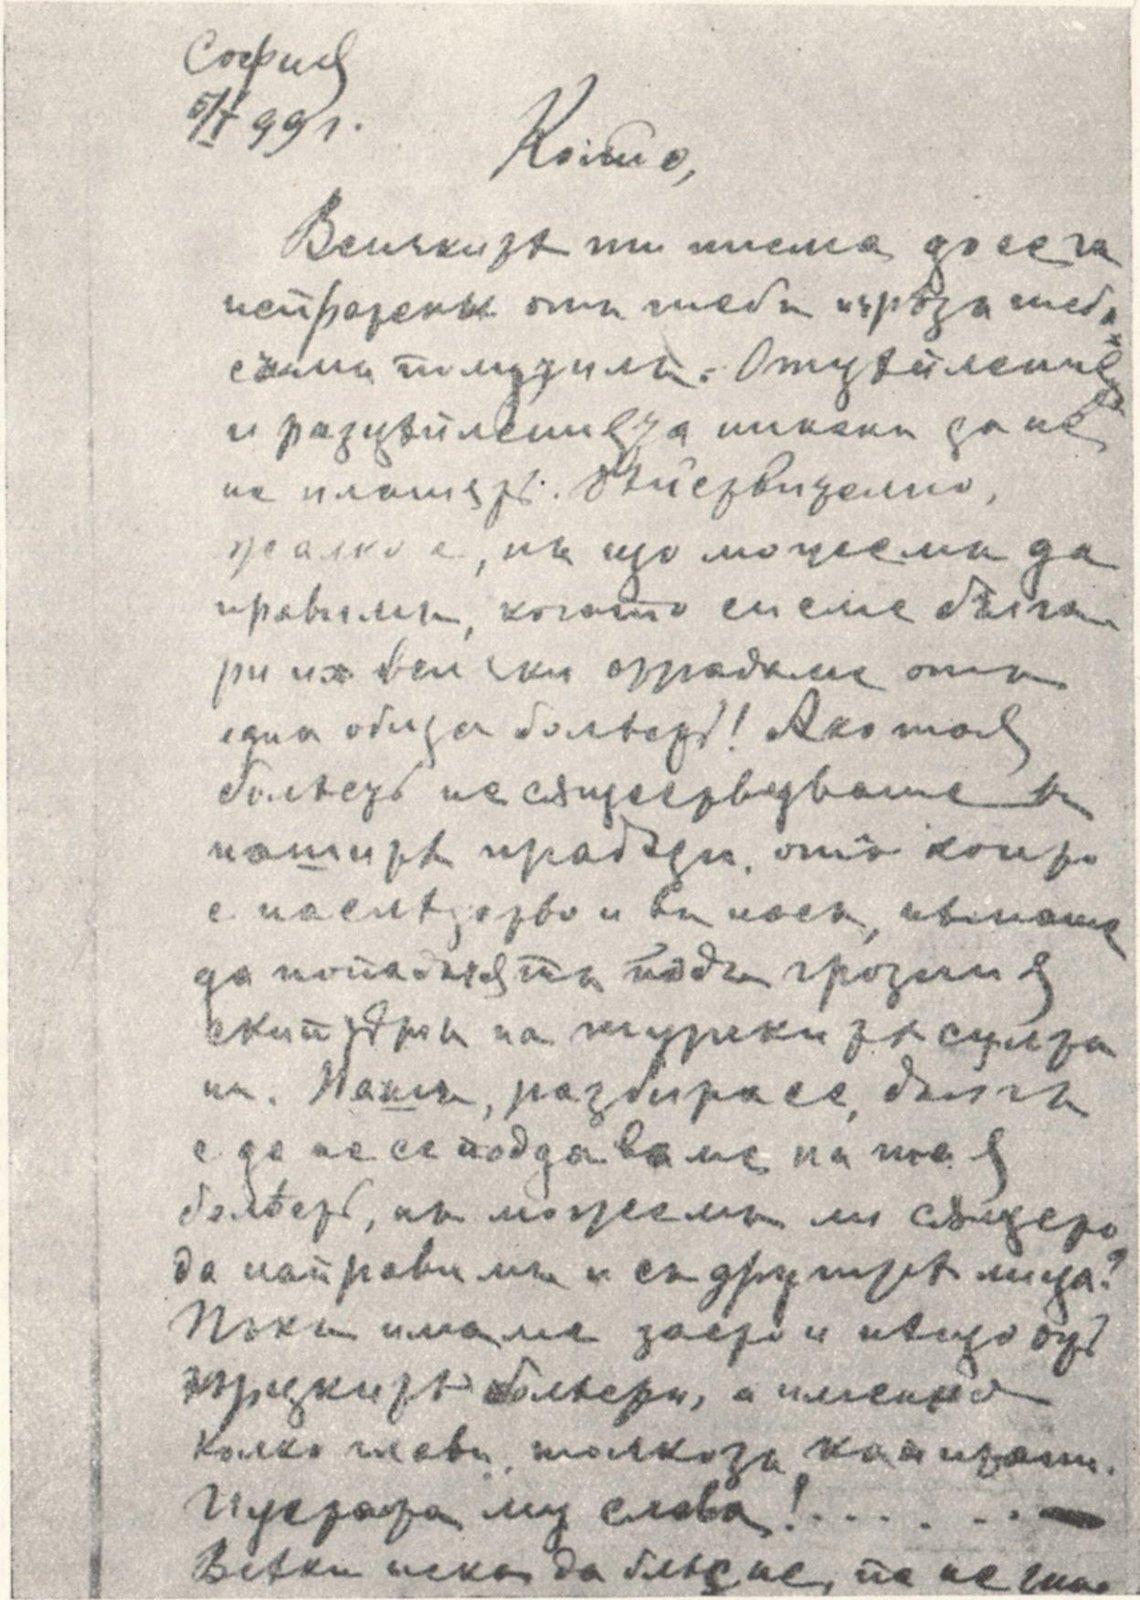 Hamilton Open Letter To Pense